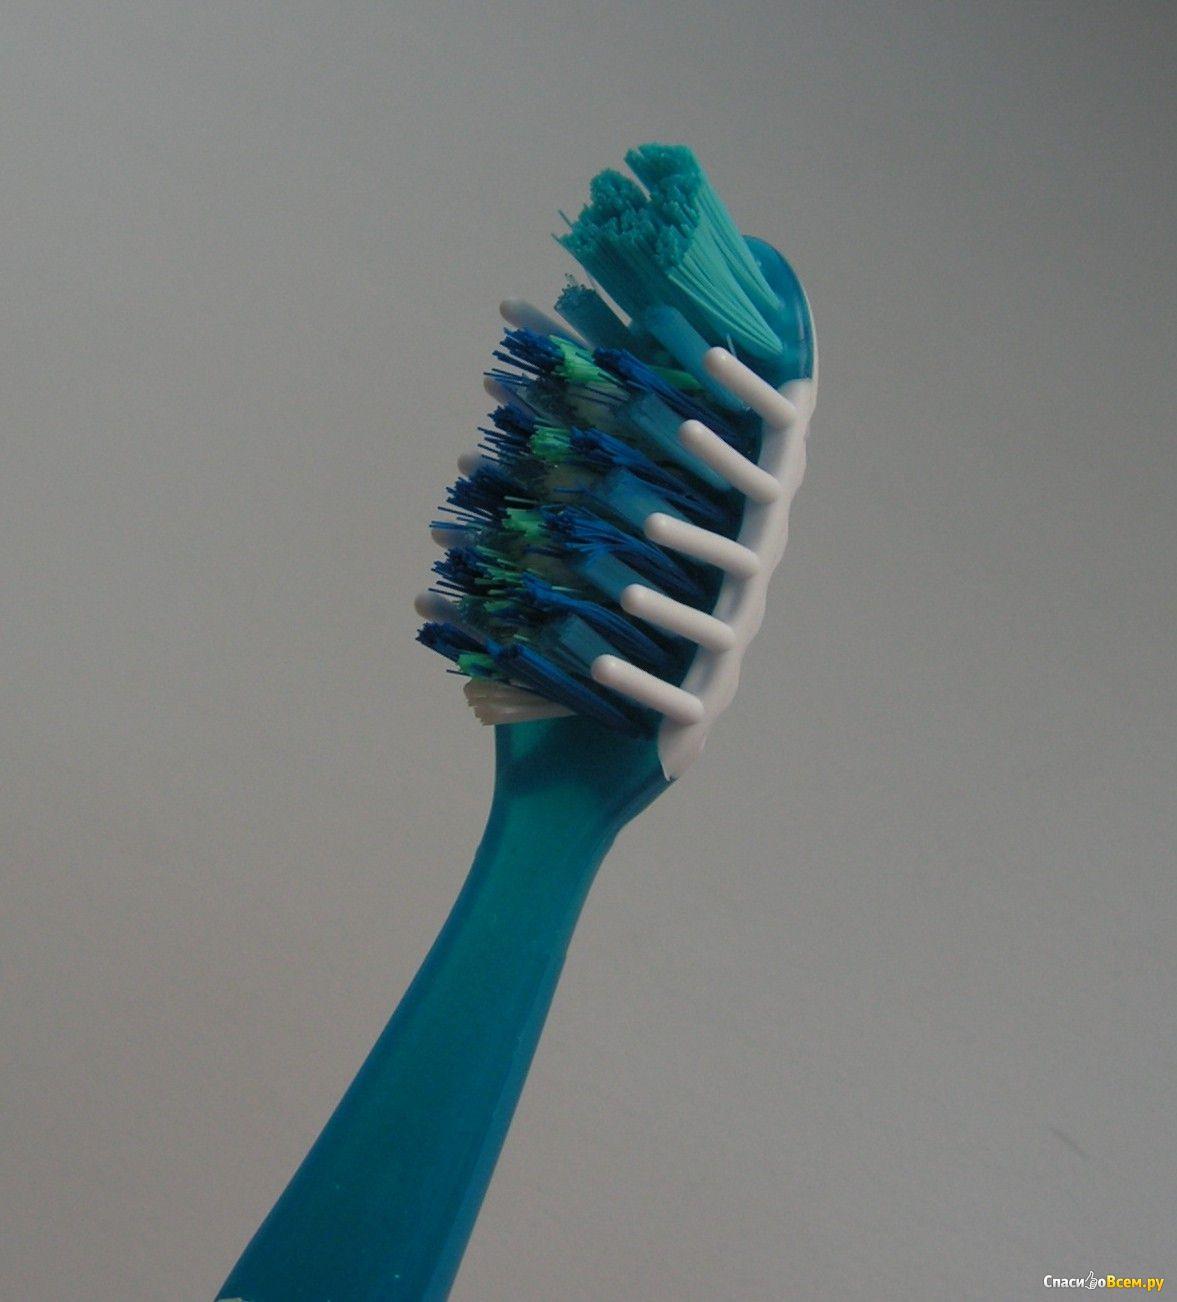 Отзыв про Набор из 2-х зубных щеток Oral-B Pro-expert Cross Action ... 1f98a35b7ff10